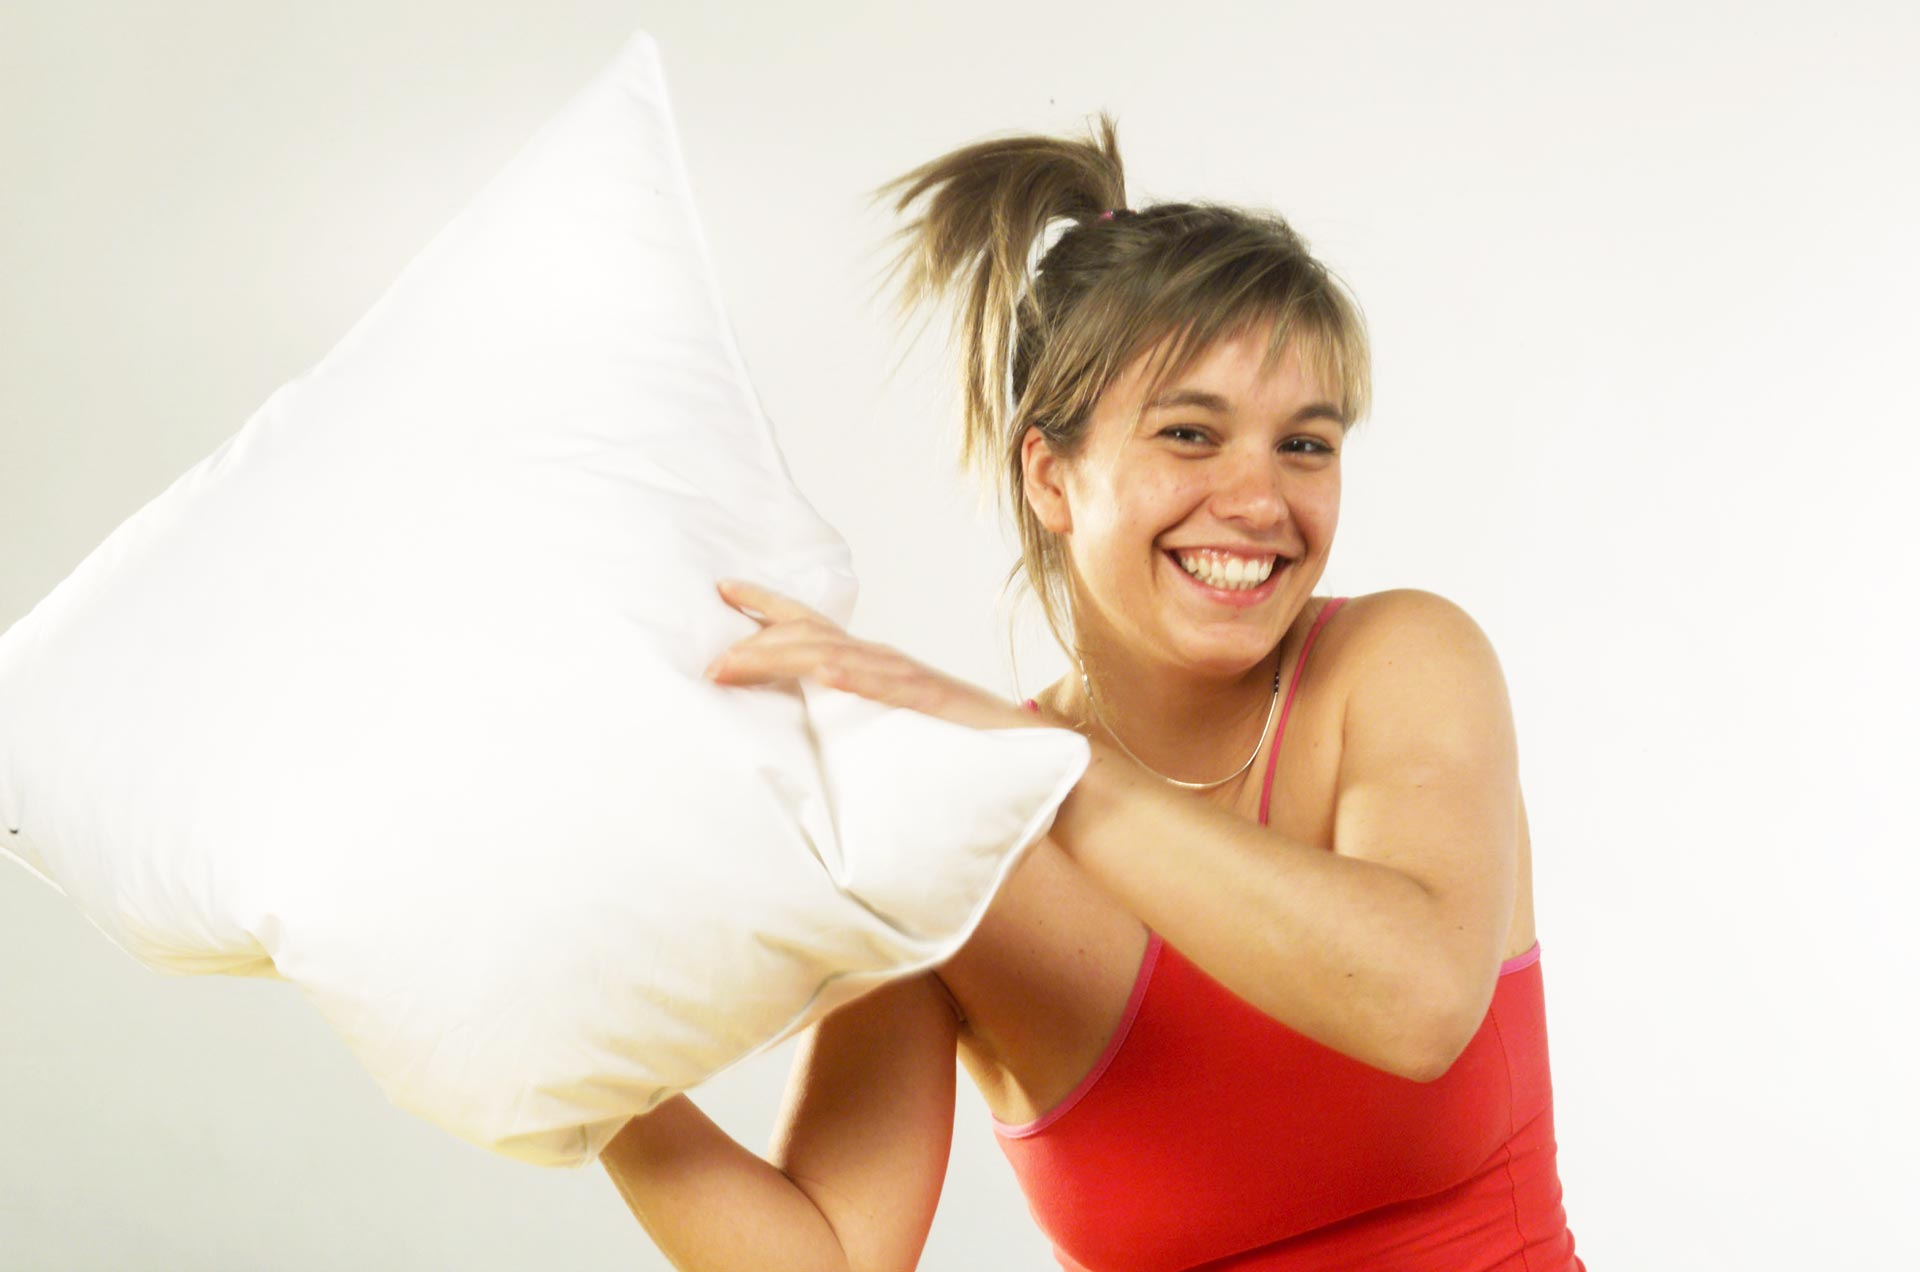 bien dormir l 39 importance d 39 un bon oreiller le blog. Black Bedroom Furniture Sets. Home Design Ideas